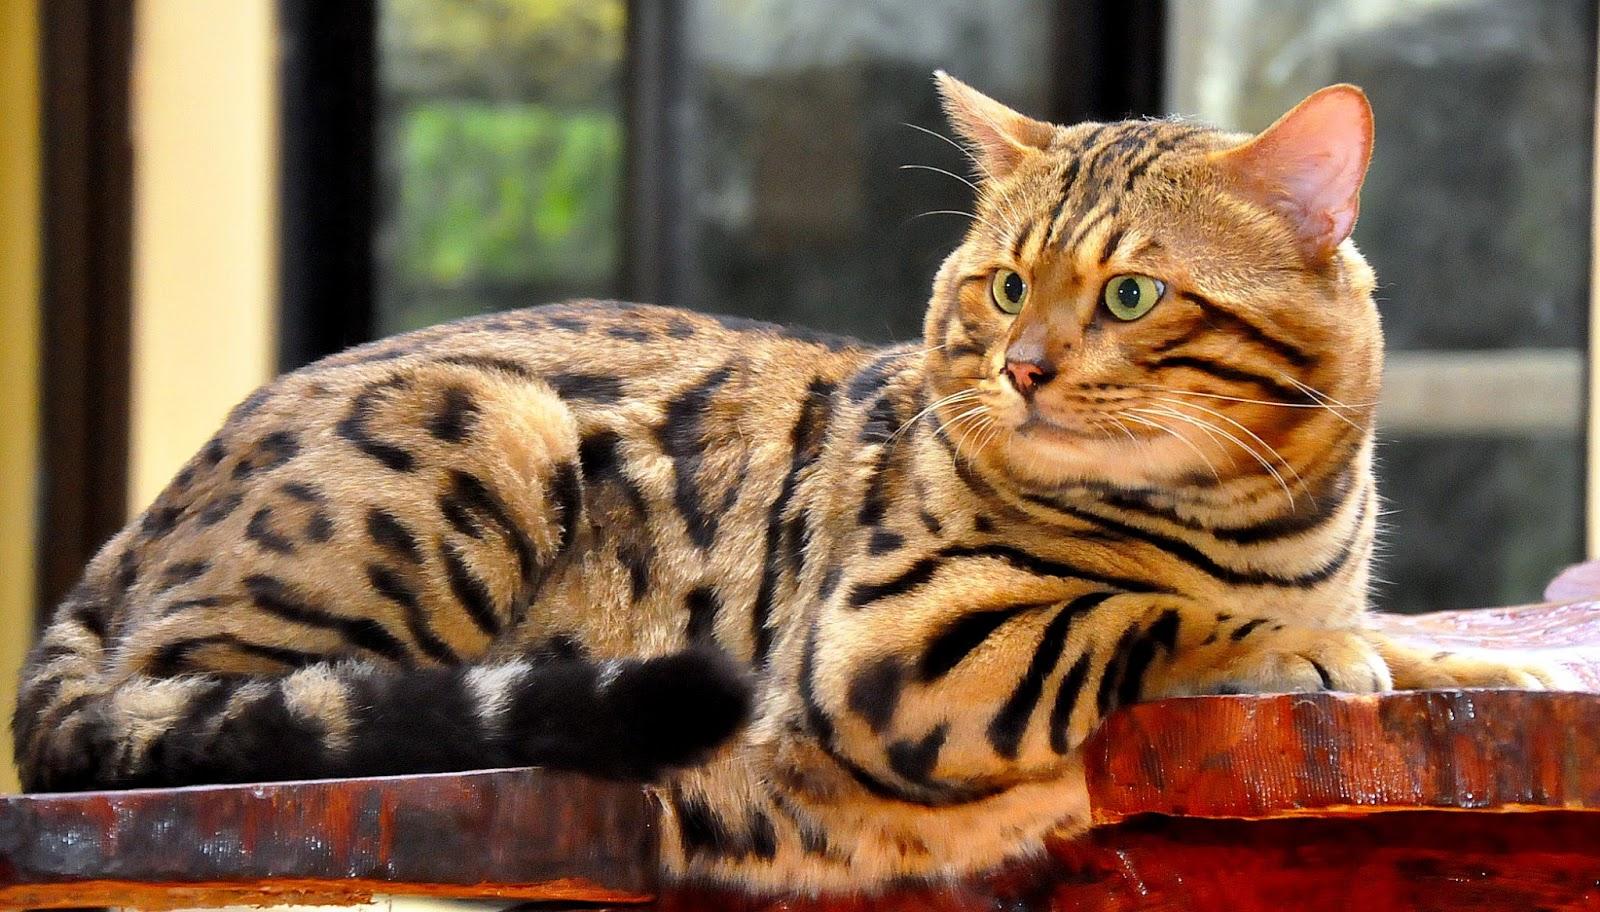 Gambar Kucing Hutan godean.web.id